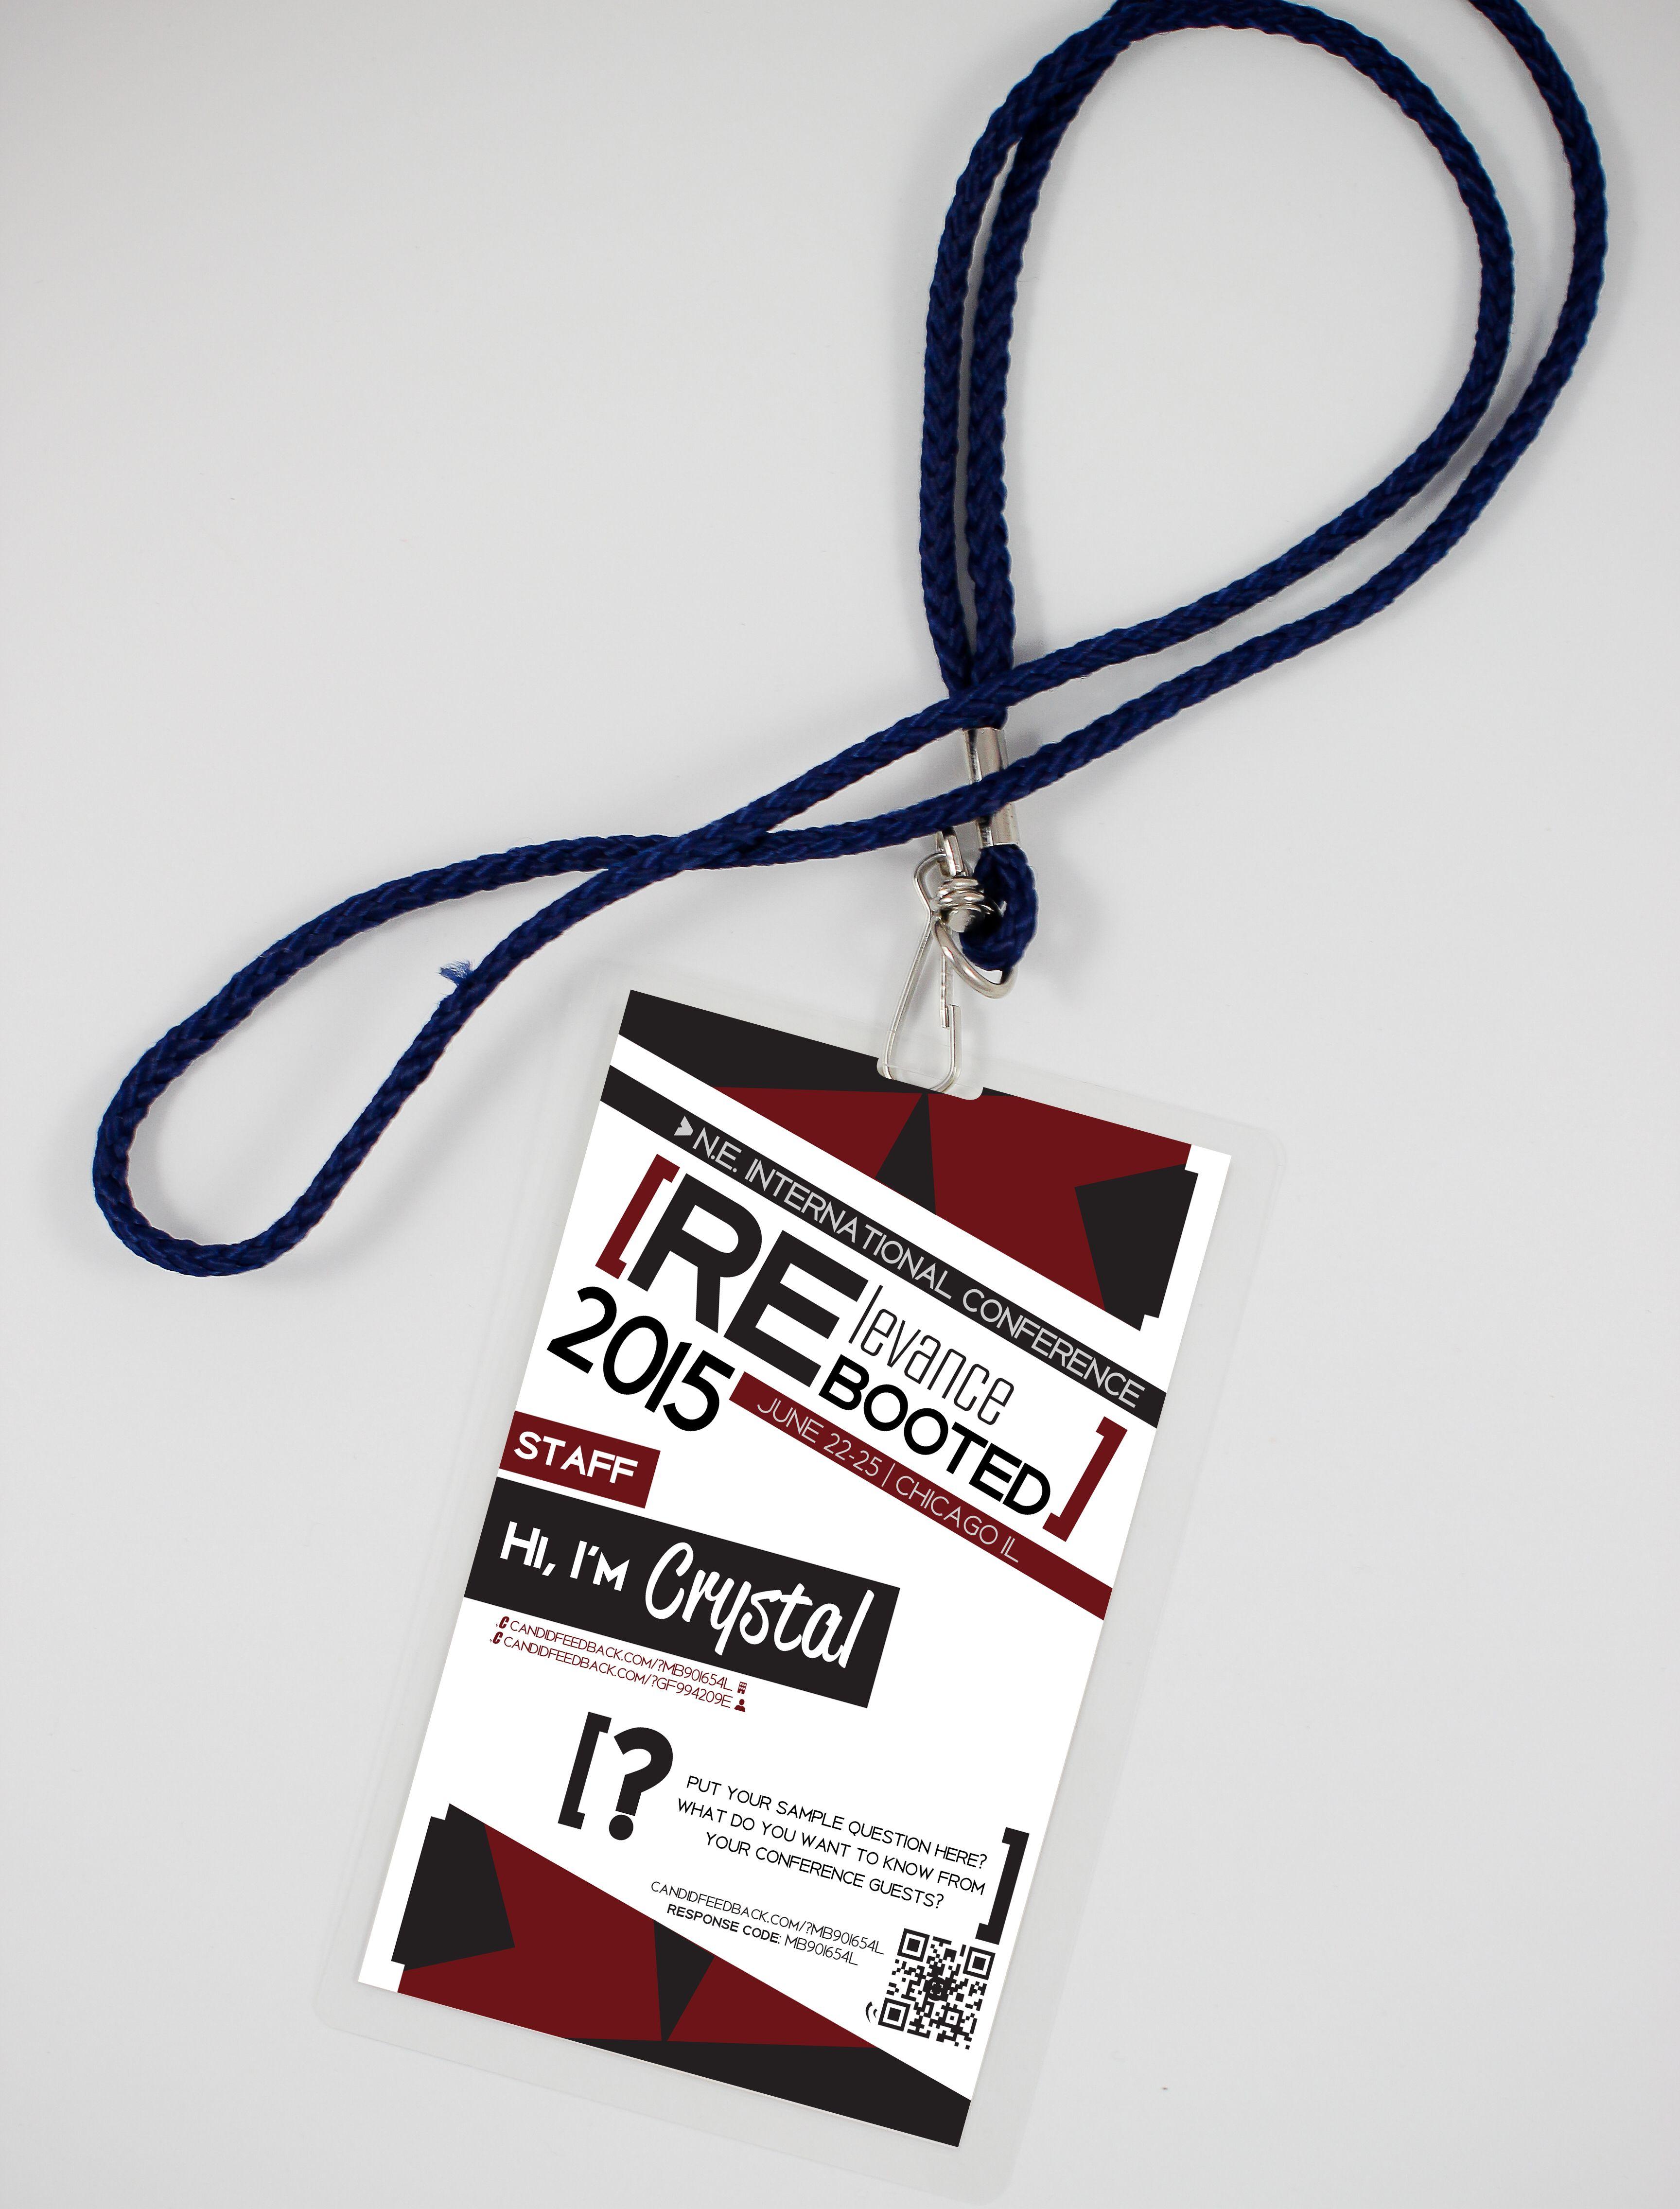 Photorealistic Mobile Feedback Conference Lanyard Design Mockup Candidcup Lanyard Designs Branding Design Tag Design